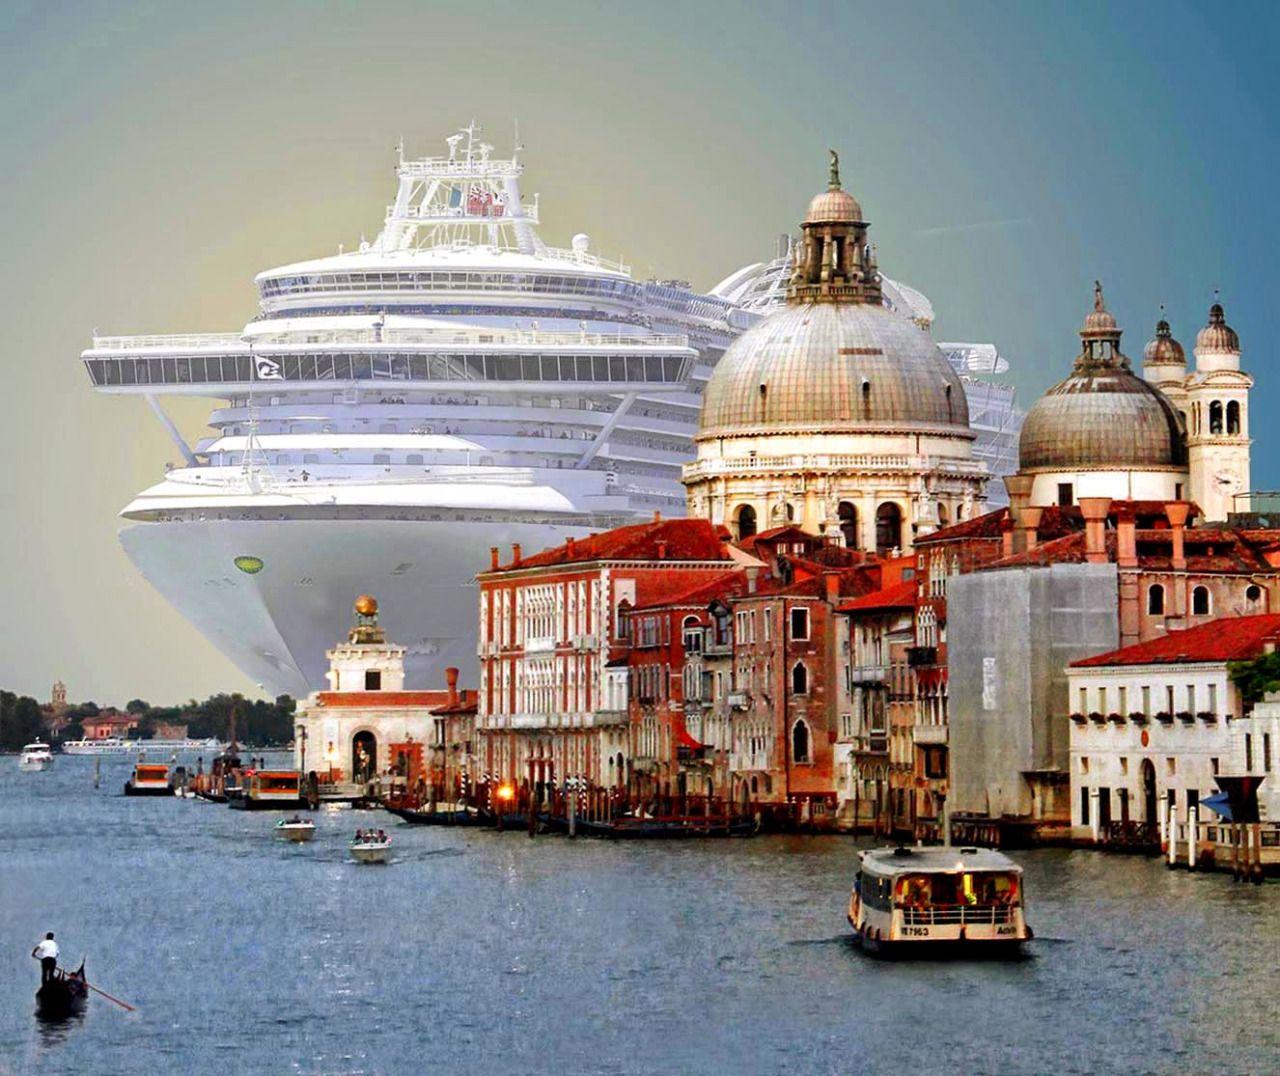 World's largest cruise ship entering Venice